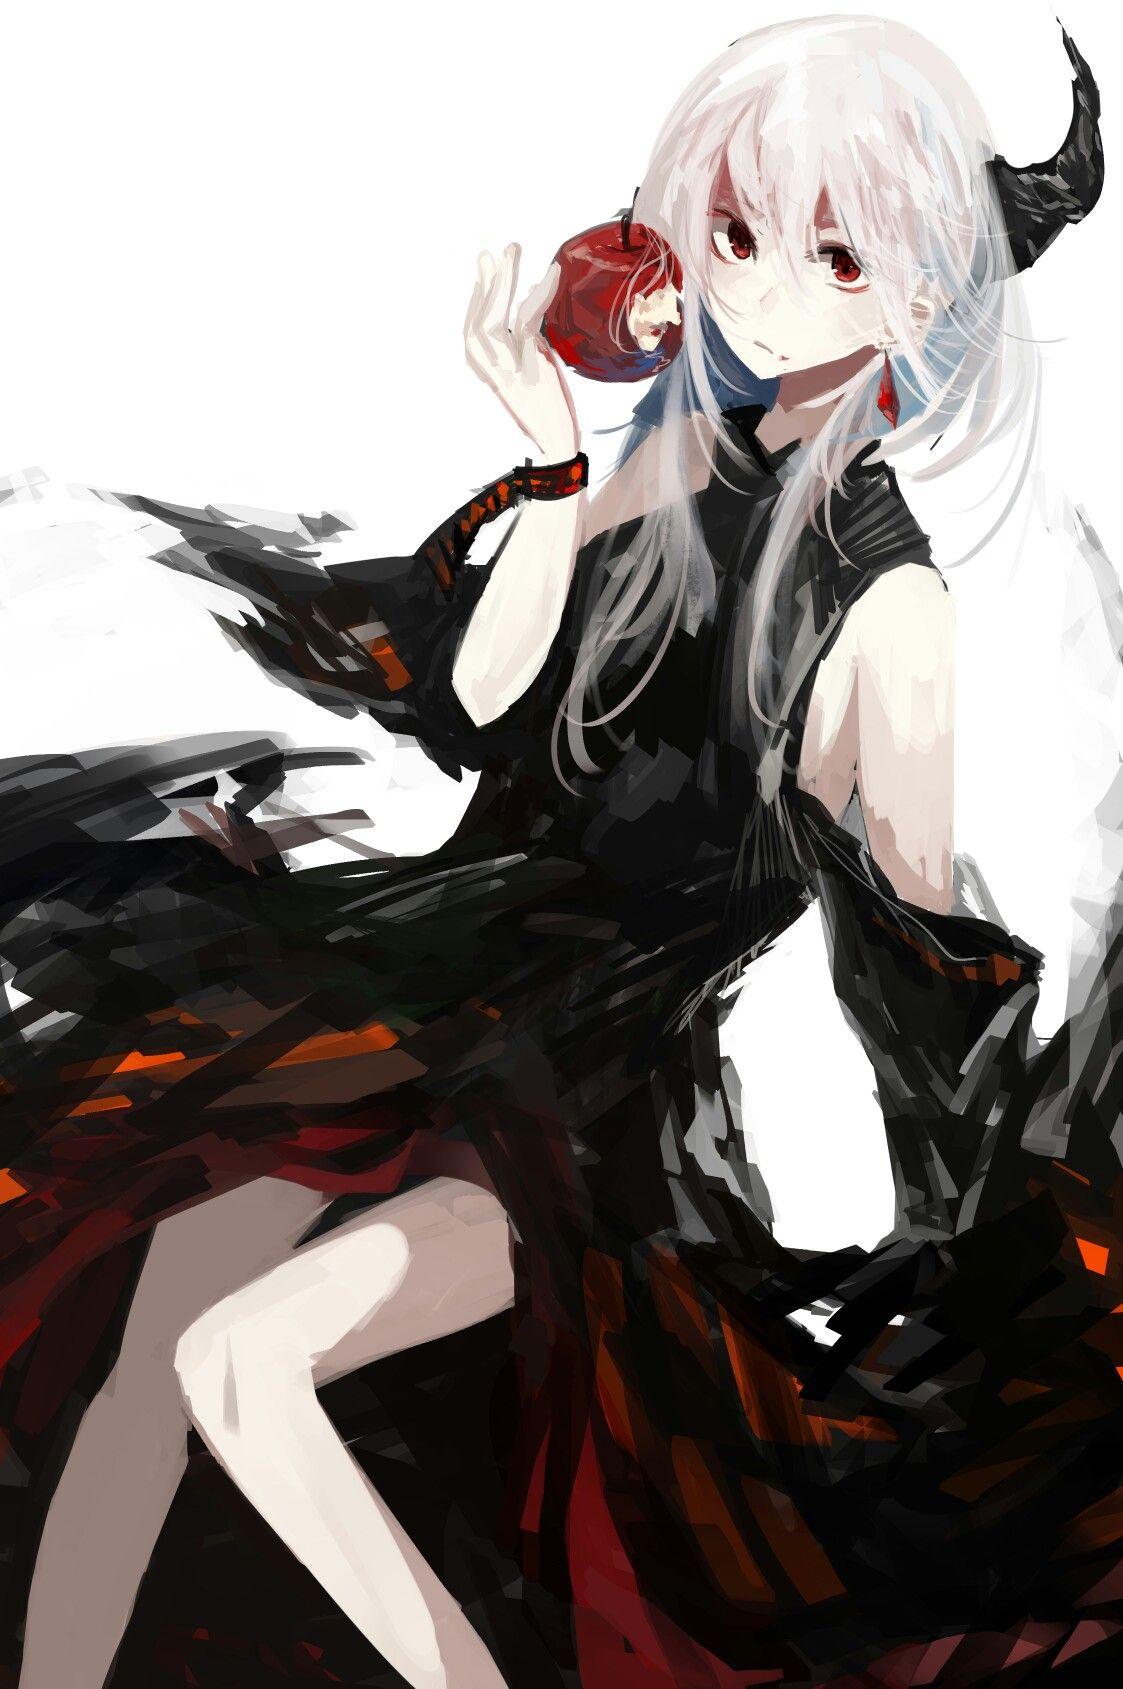 Anime tóc trắng bí ẩn